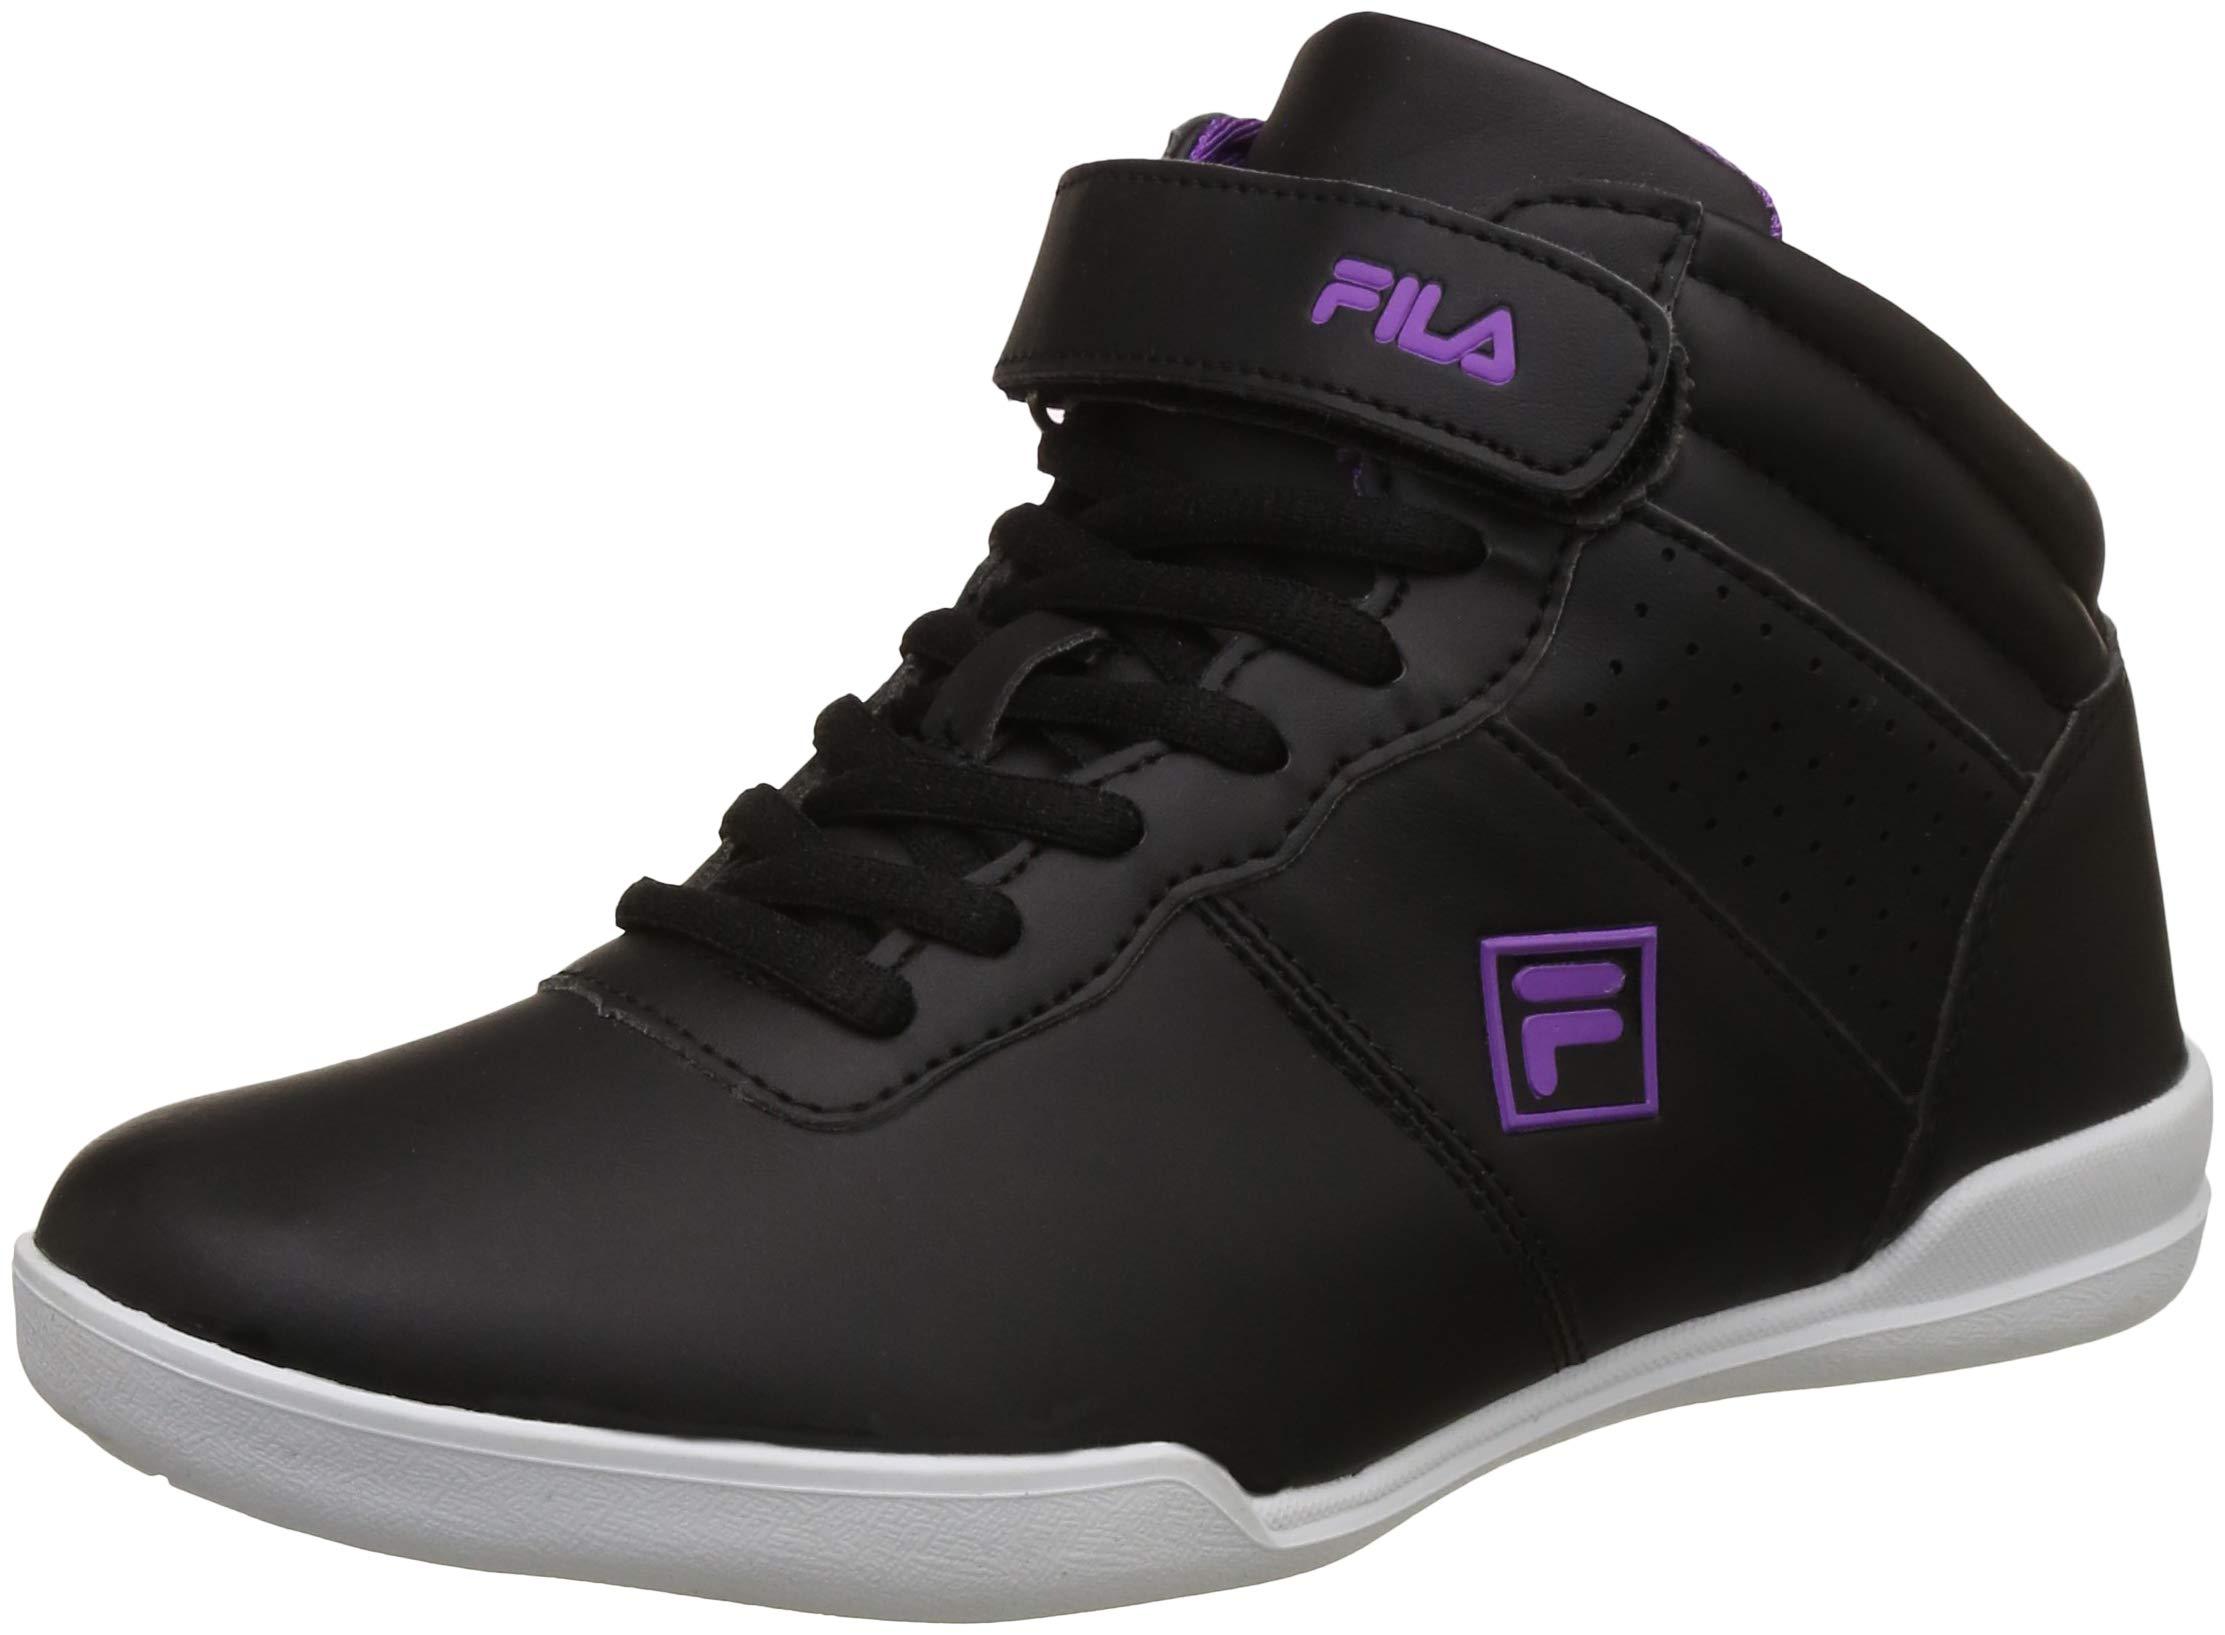 Fila Women's Misha Sneakers